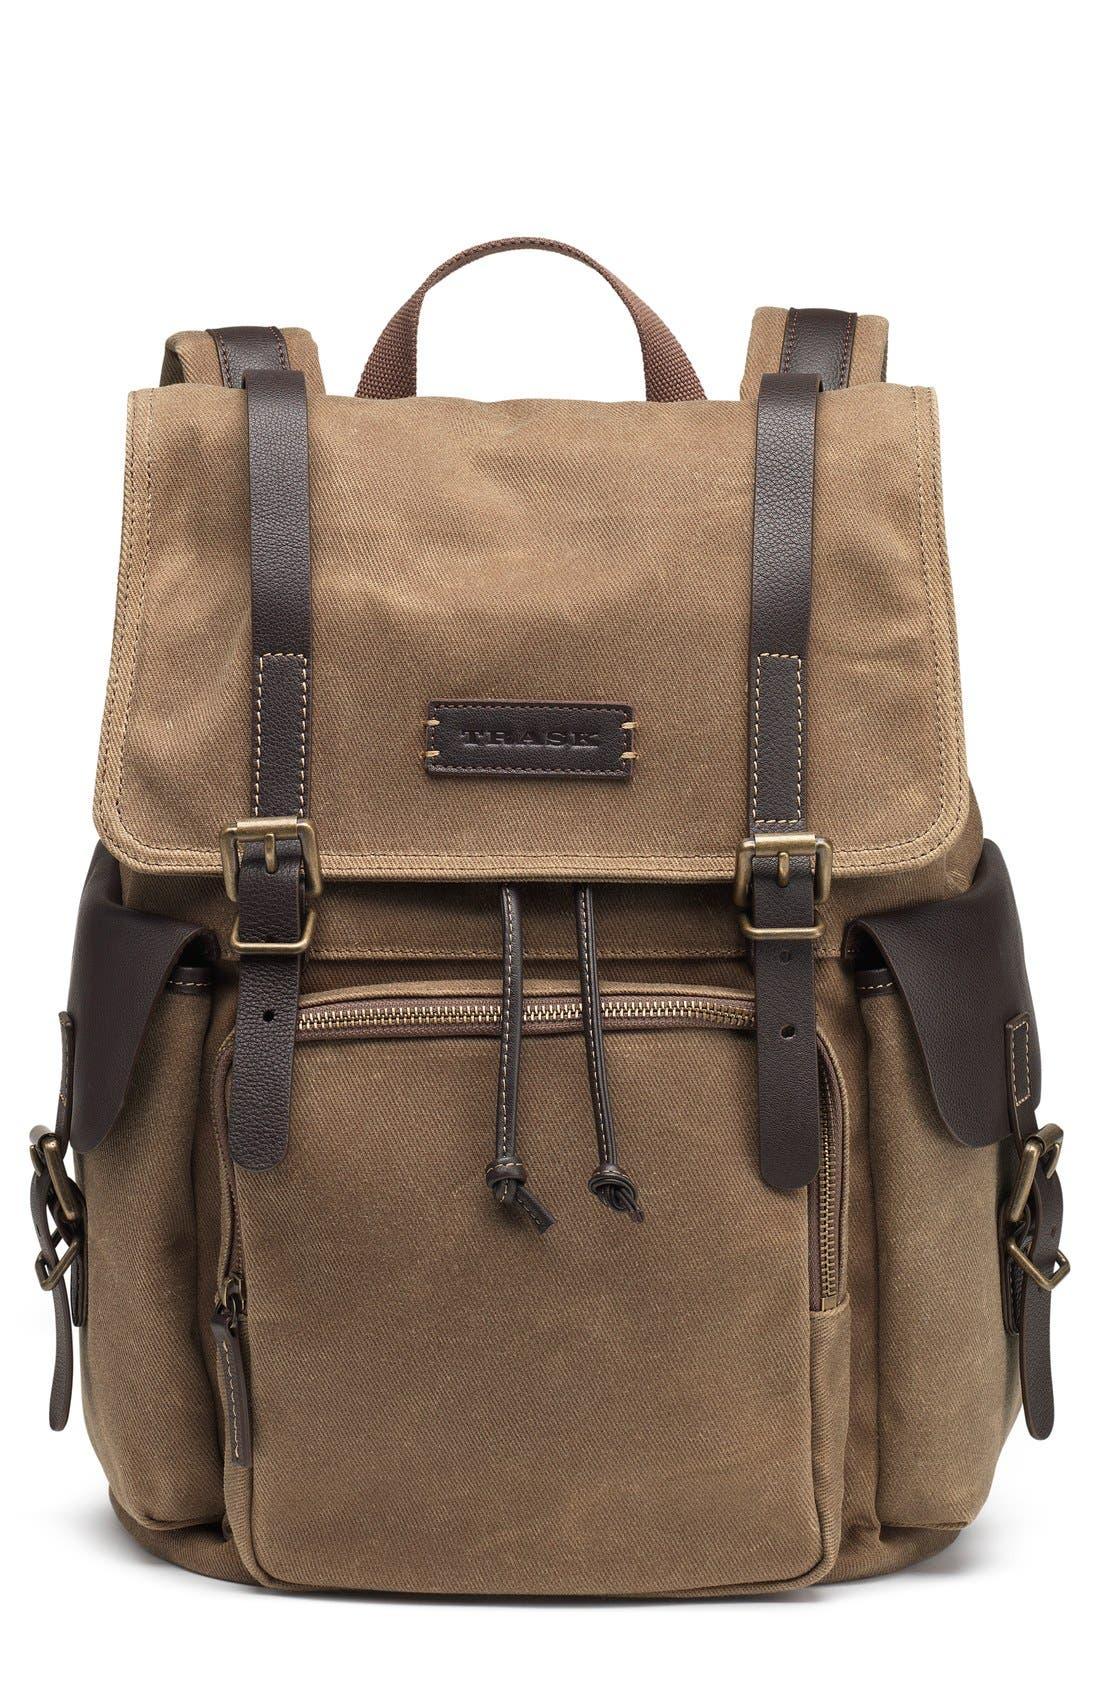 'Bridger' Waxed Canvas Backpack,                             Main thumbnail 1, color,                             RANGER TAN